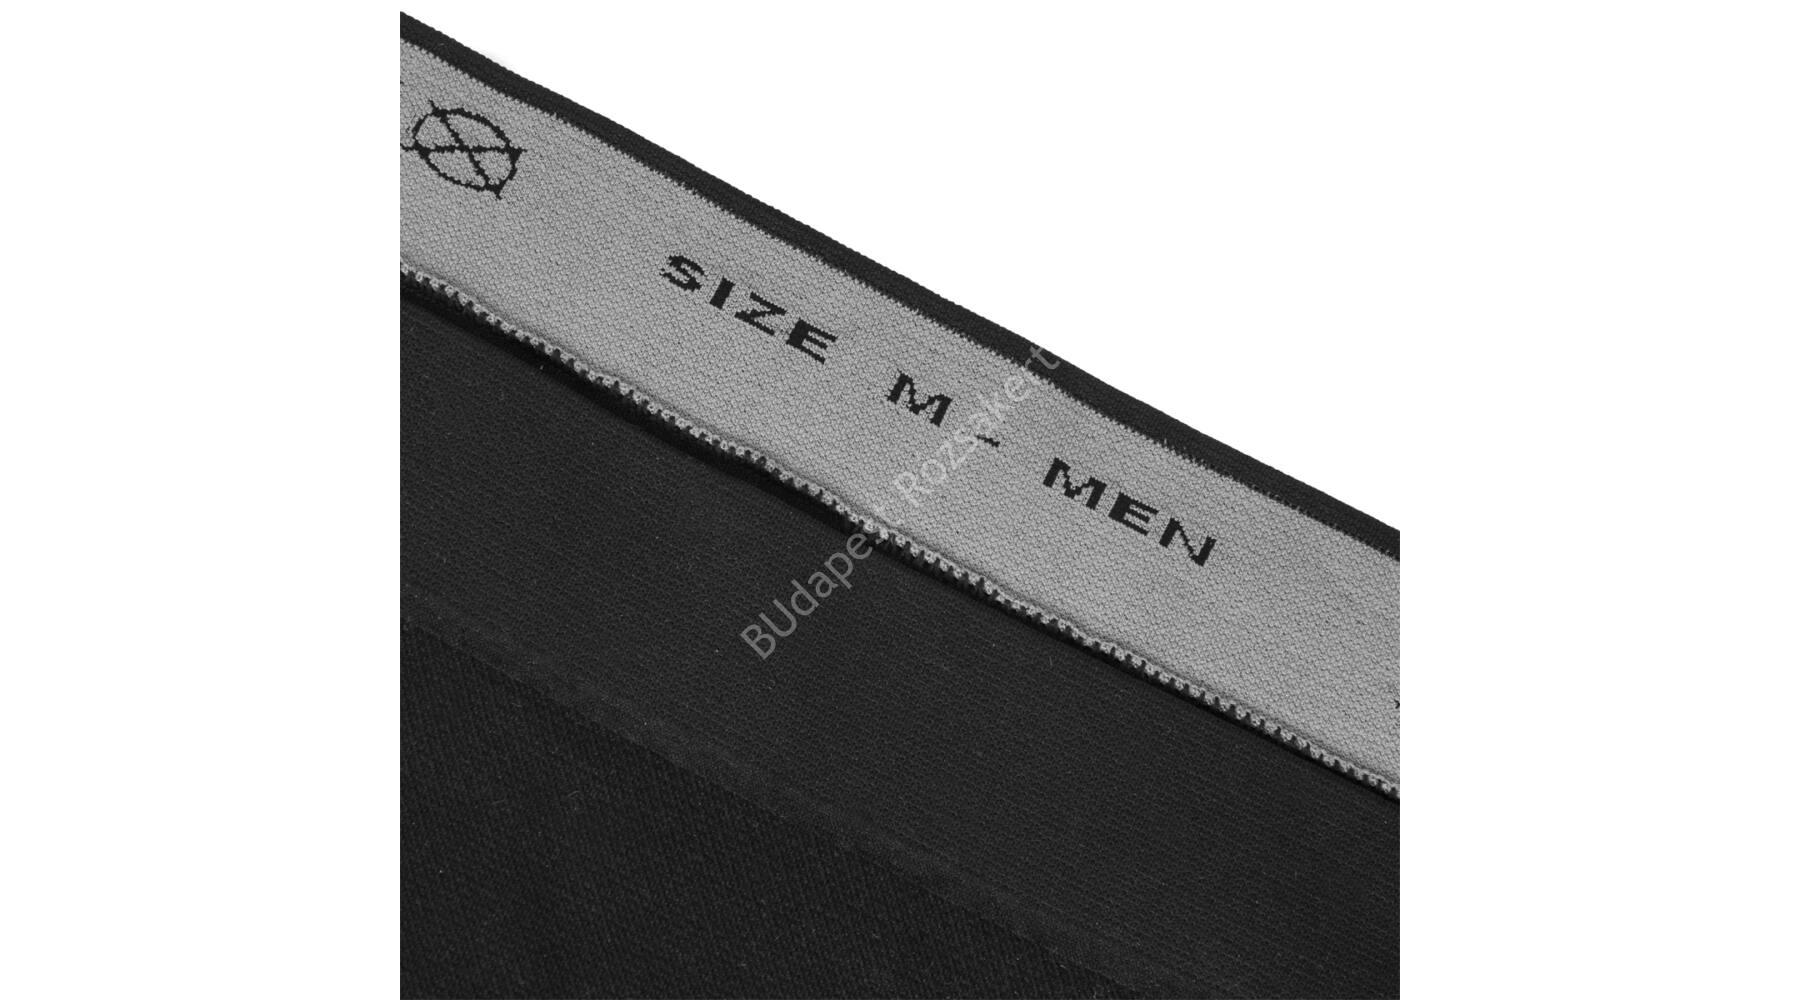 735c26c331 Zajo Contour M Pants férfi strech aláöltözet, fekete - a-Wear Sport ...